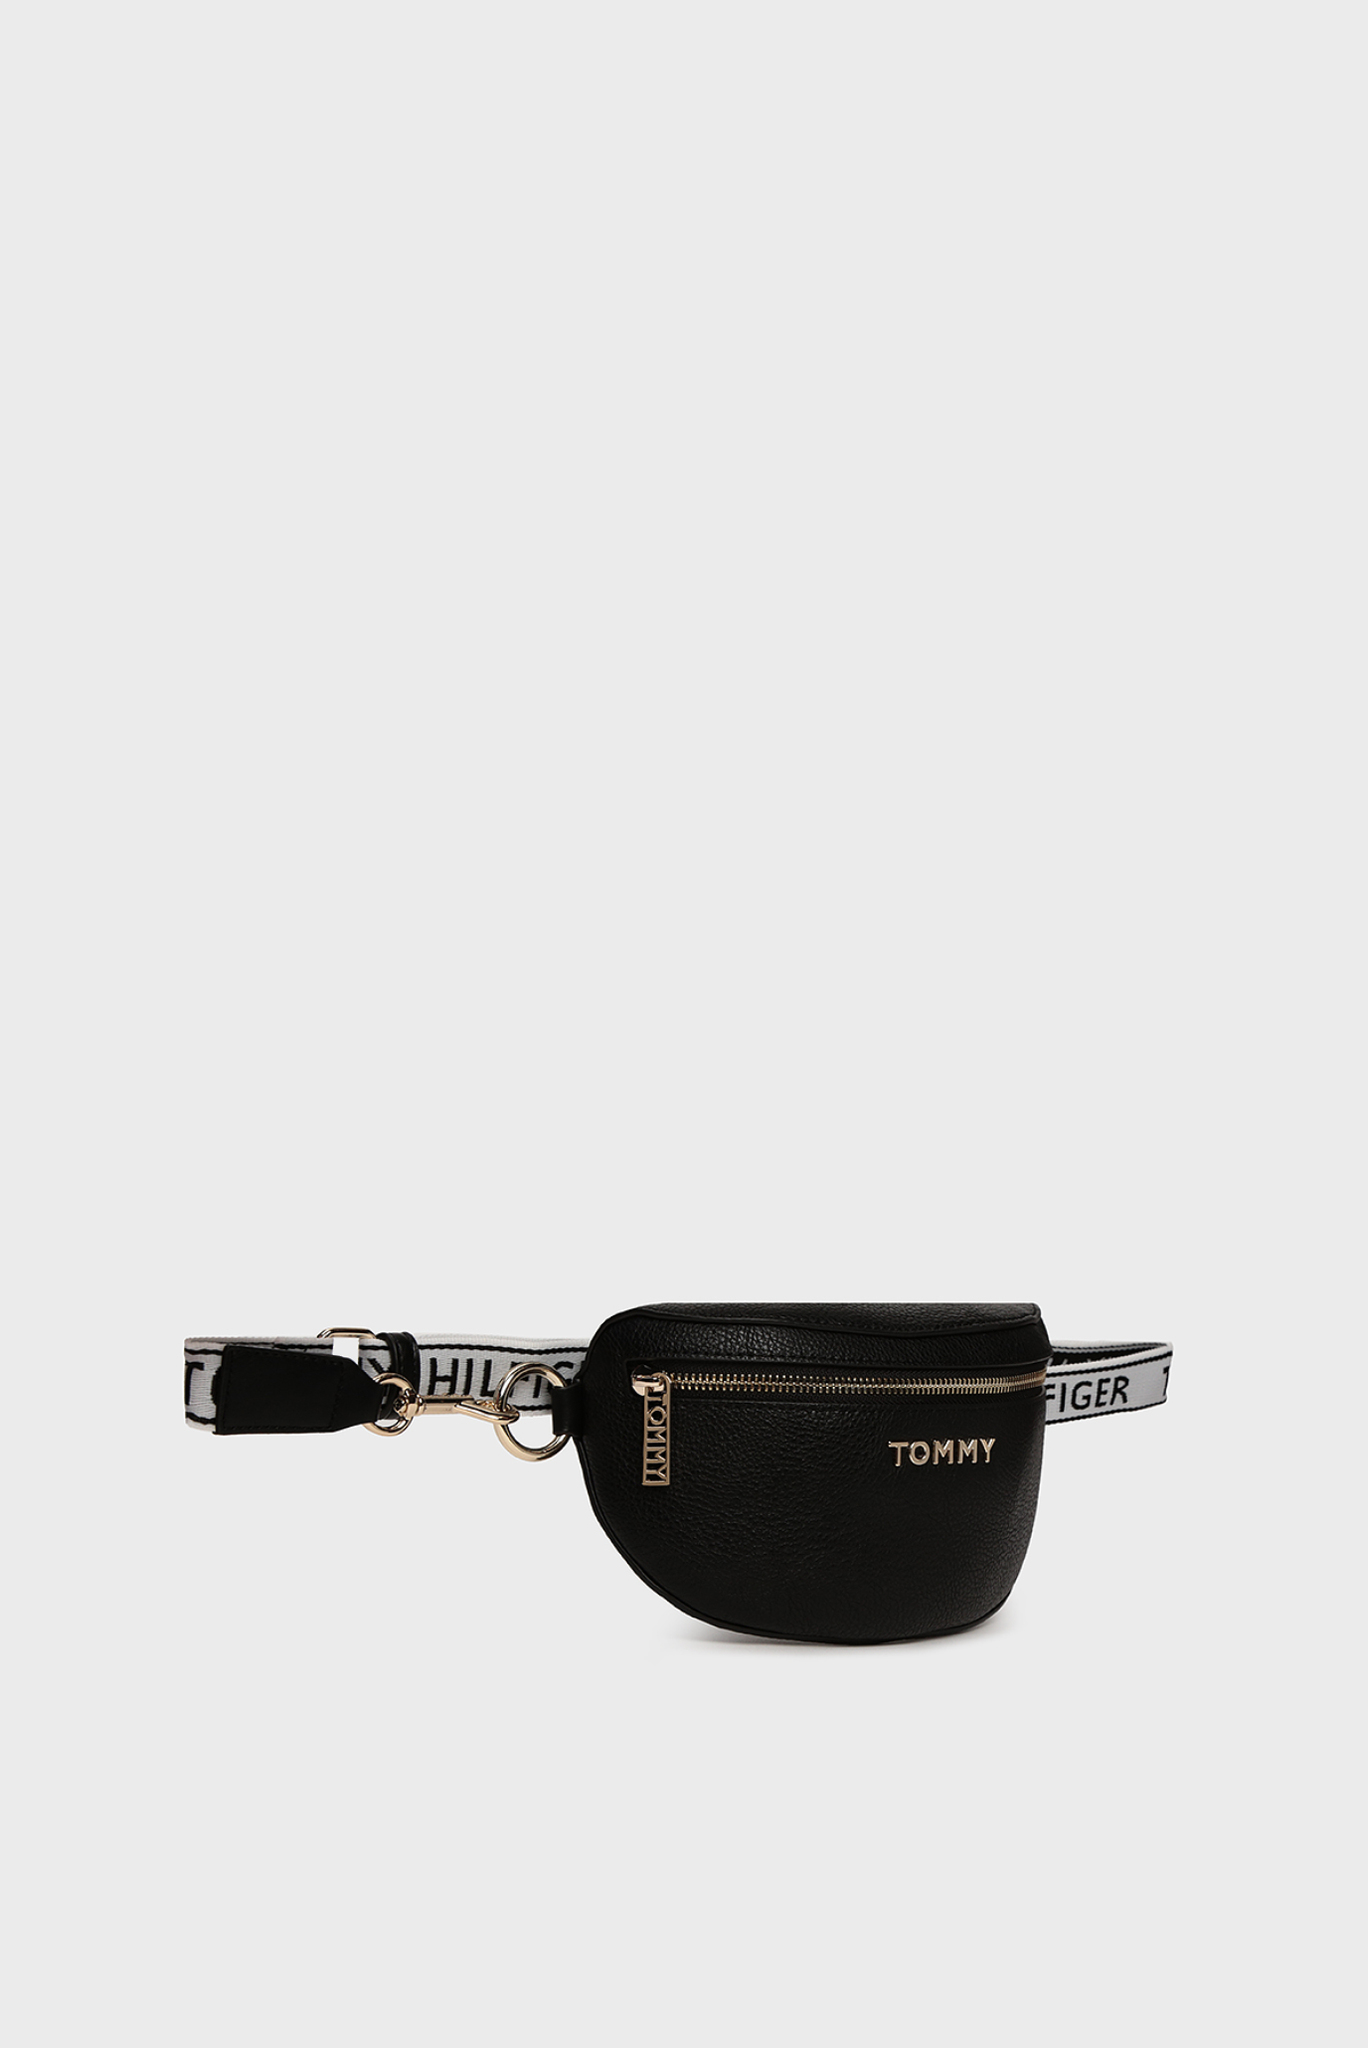 Женская черная поясная сумка ICONIC TOMMY BUMBAG Tommy Hilfiger